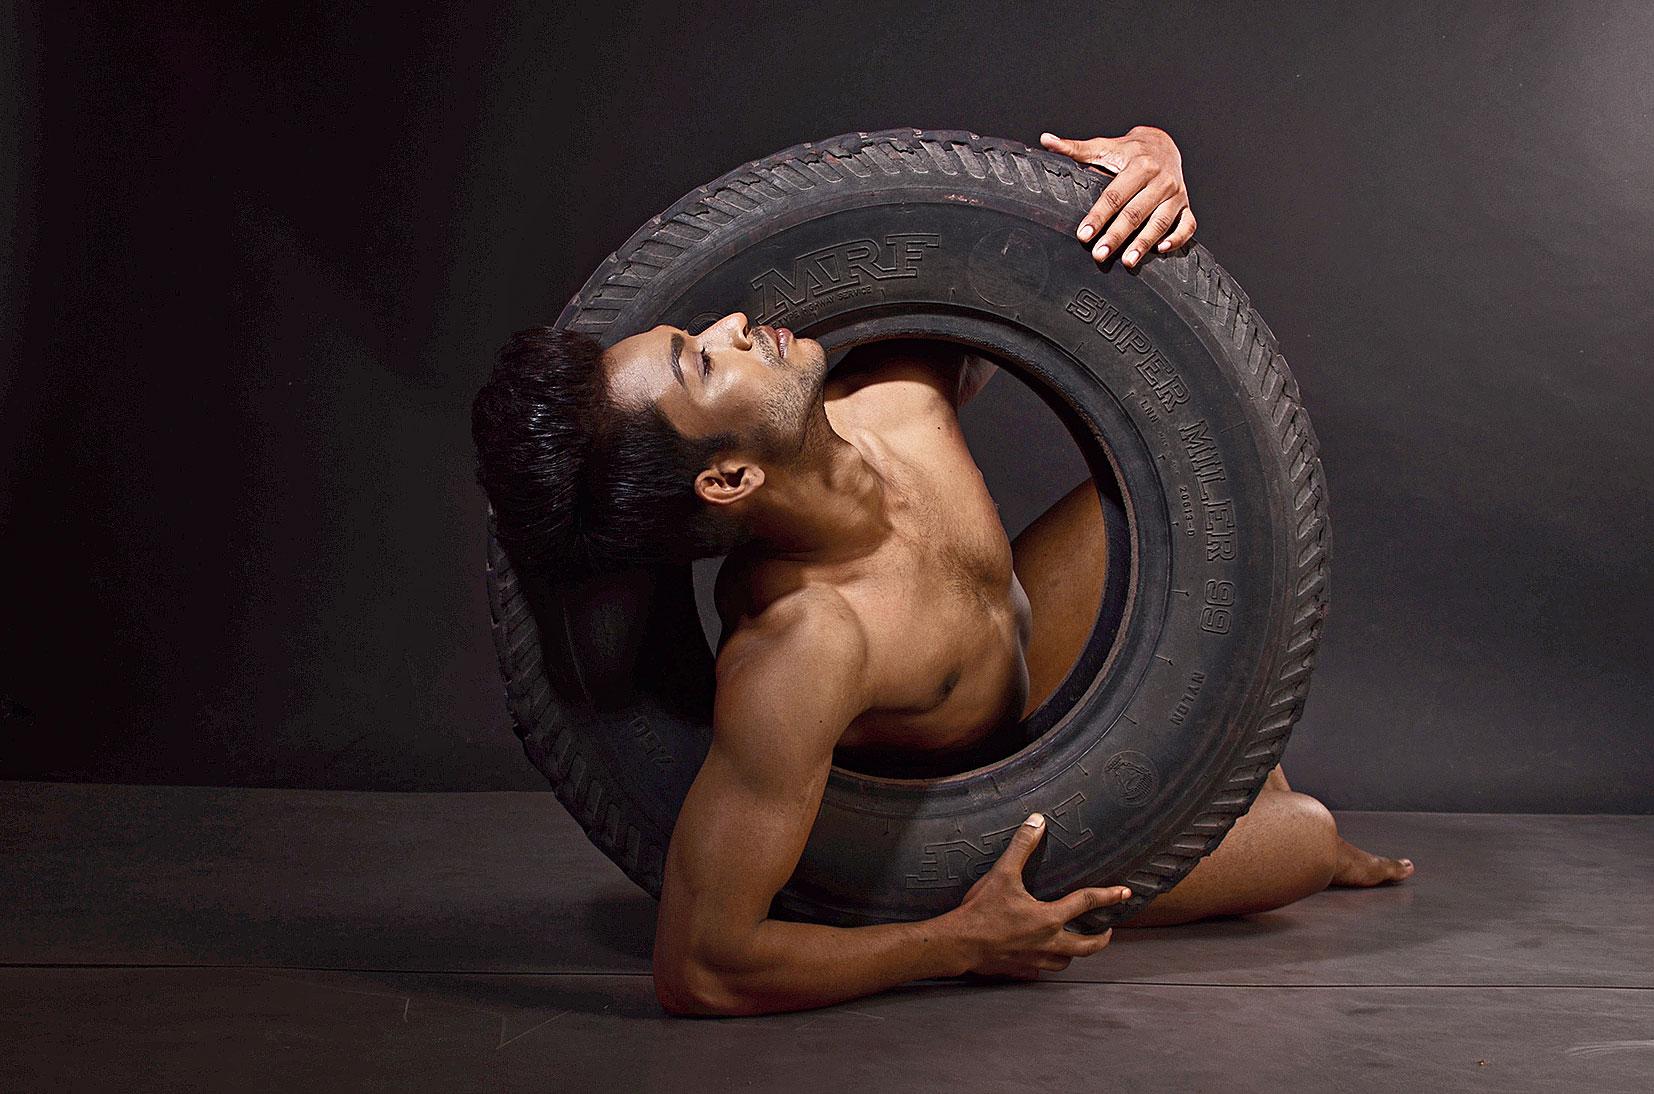 BARE ESSENTIALS: Model at Aungshita Chatterjee's studio